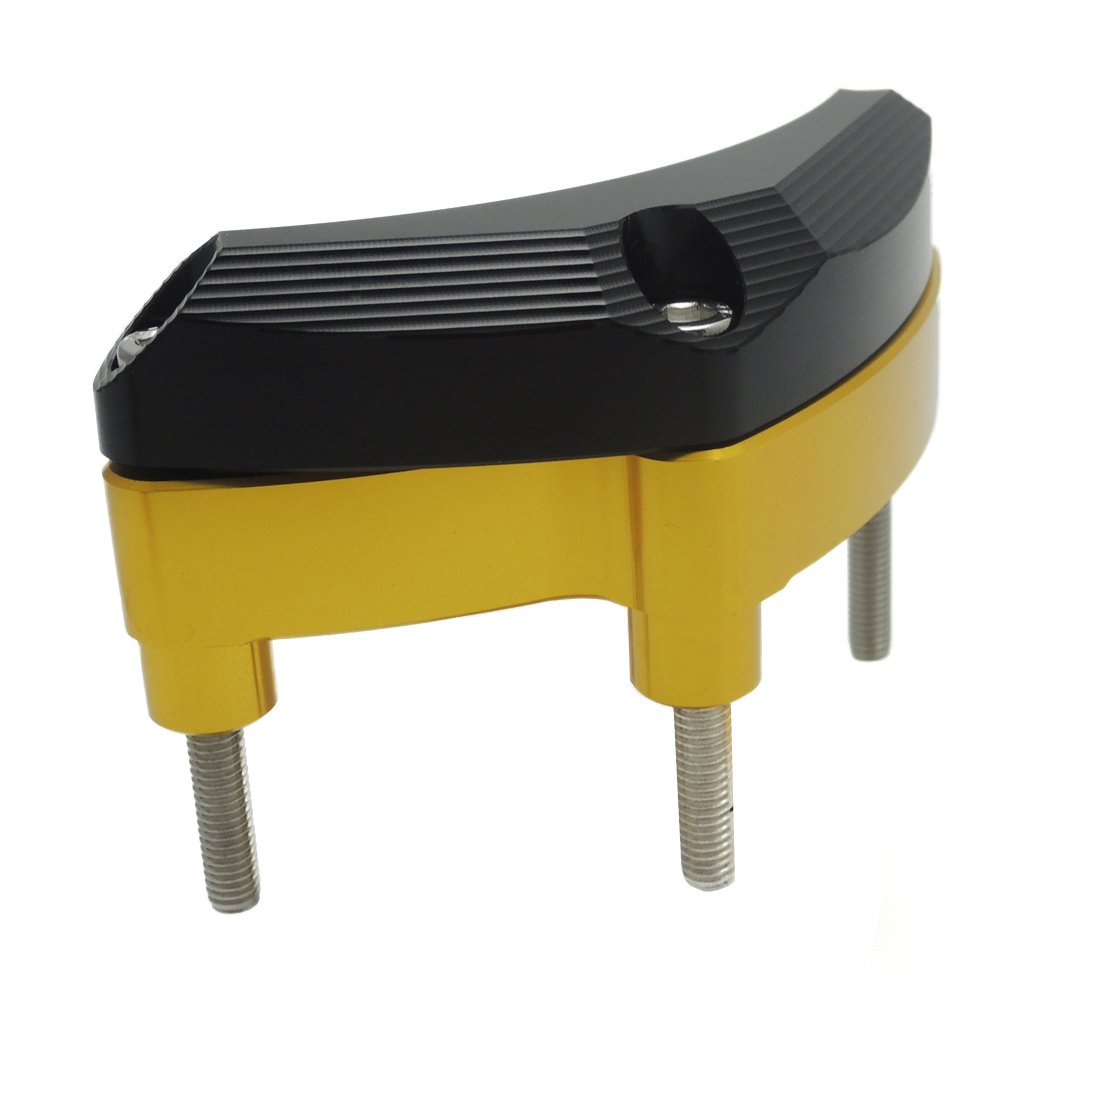 MT-09/TRACER 2015-2016 Kit protecci/ón de motor MT-09 para Yamaha MT 09/2014-2015 XSR900 2016 titanio